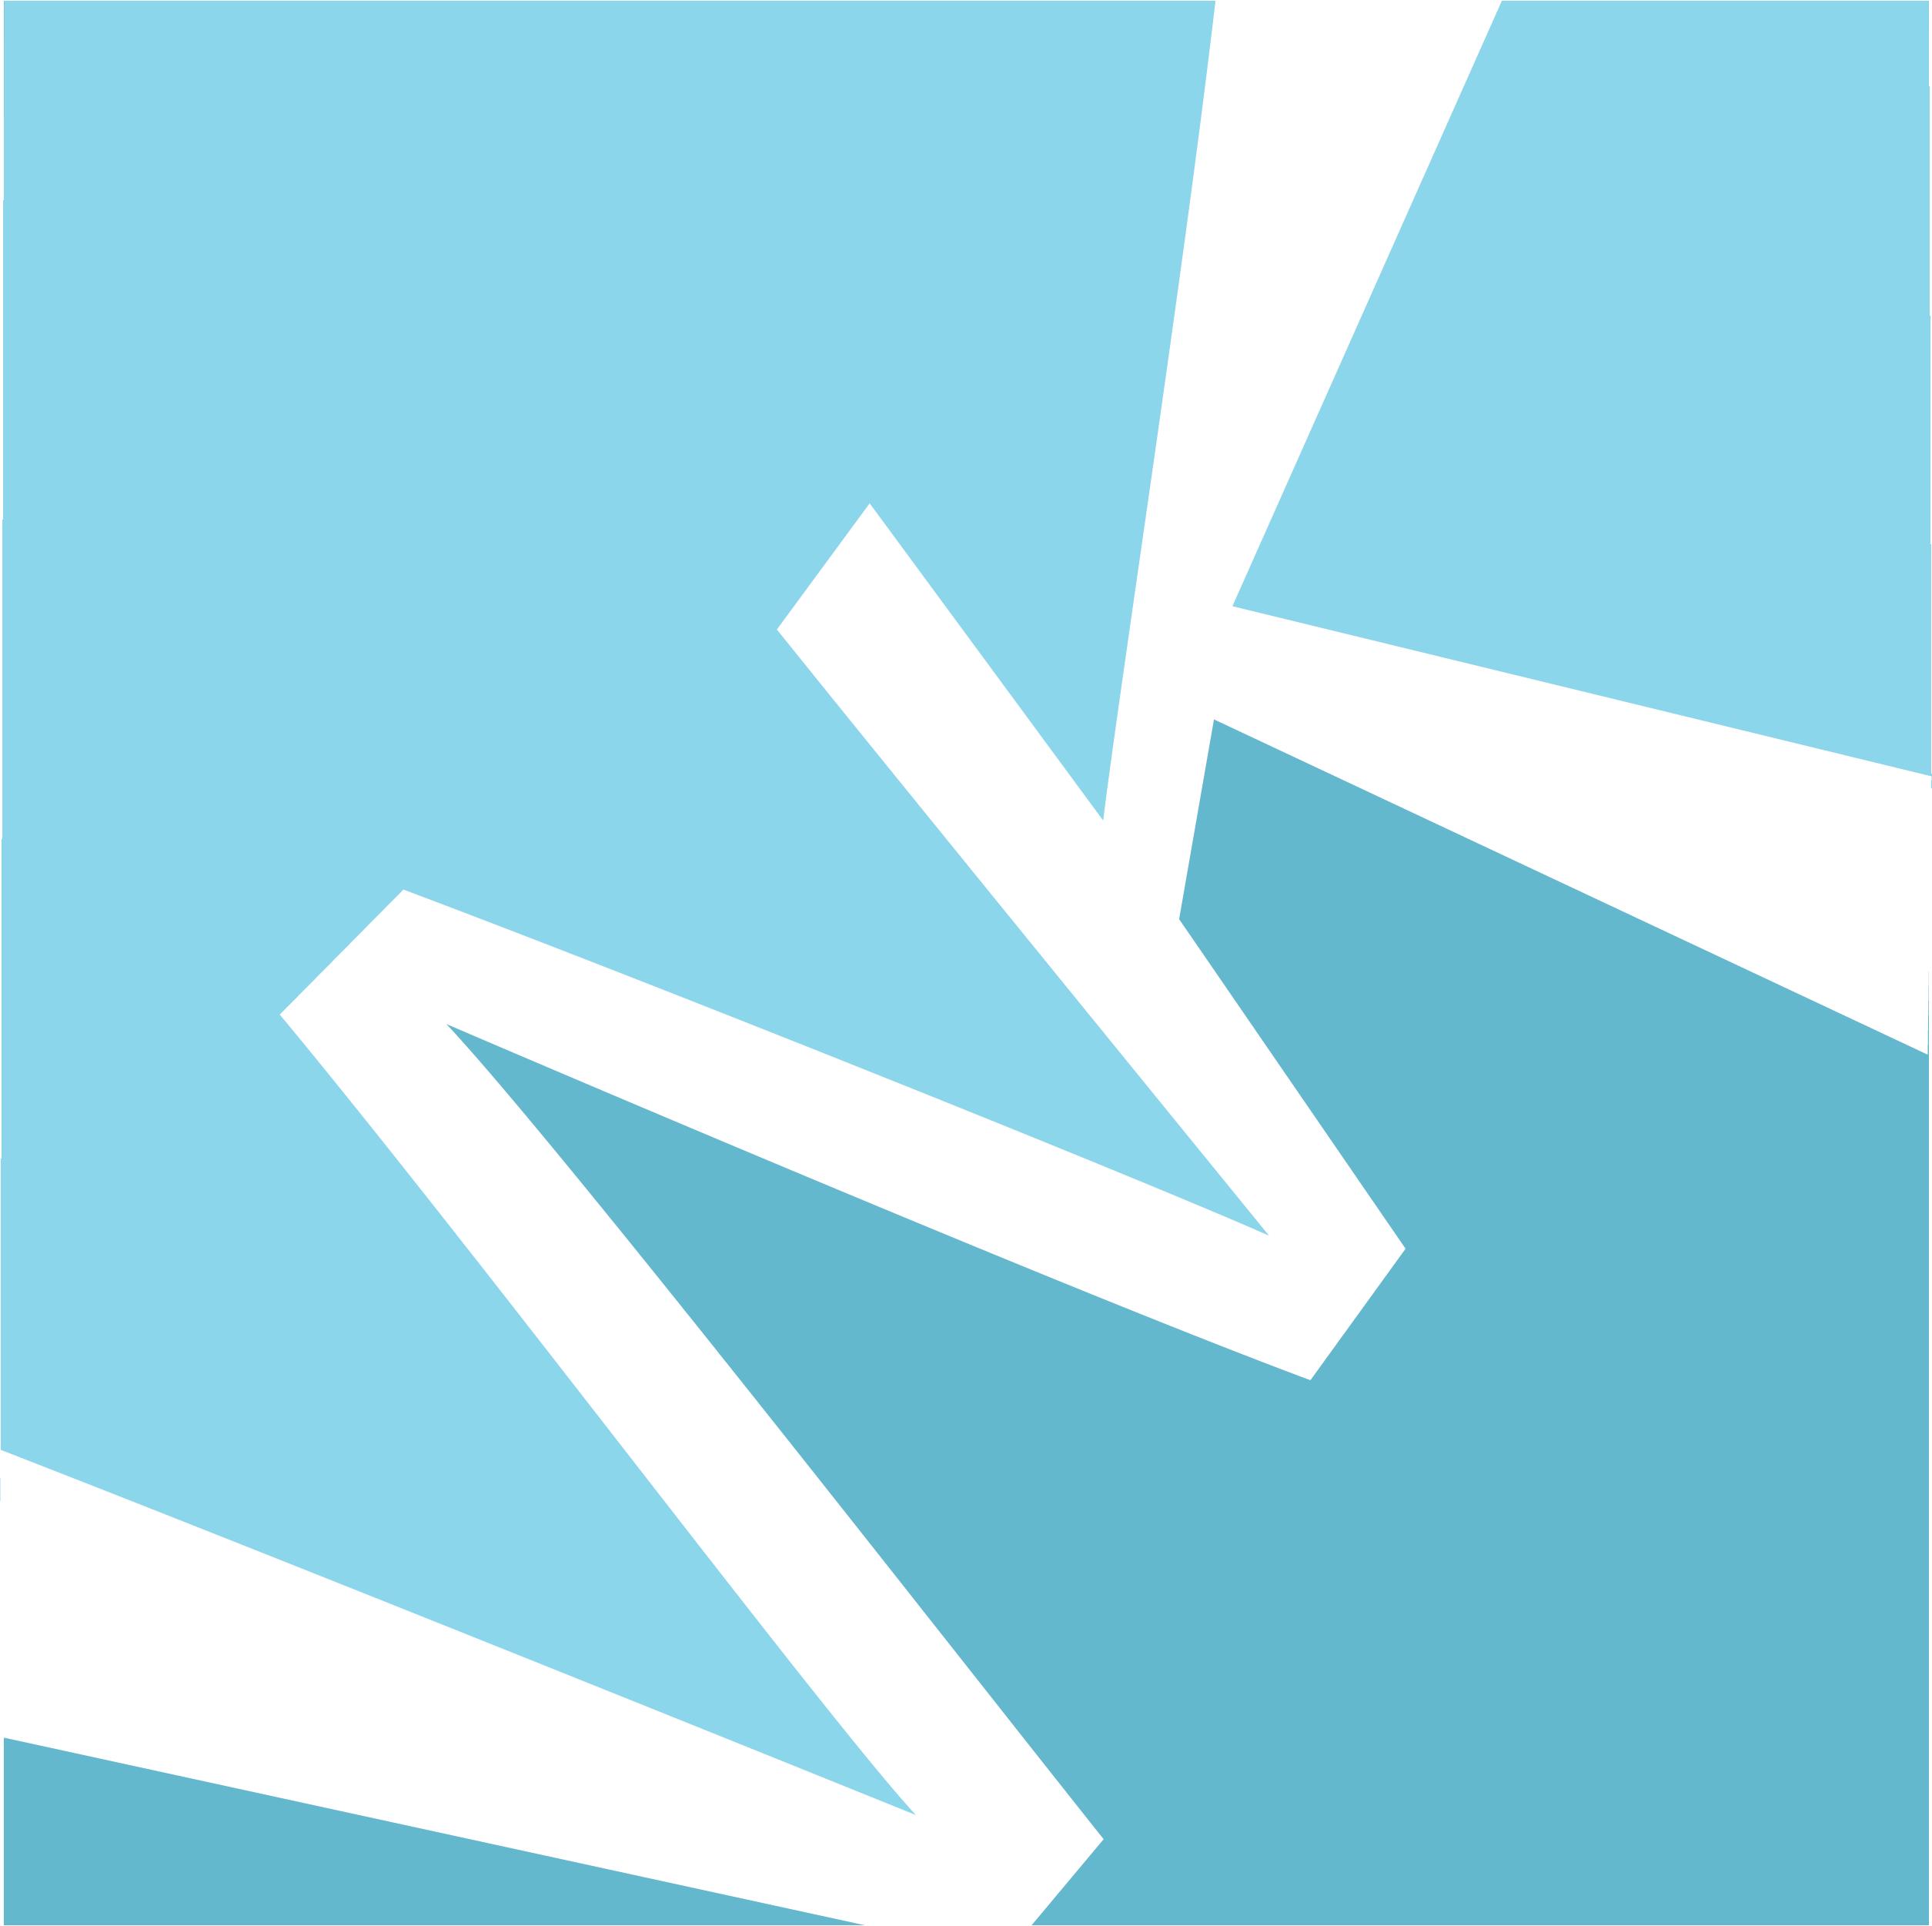 Wendy Kovacaj logo. Diagonal W and K in white on a blue background.